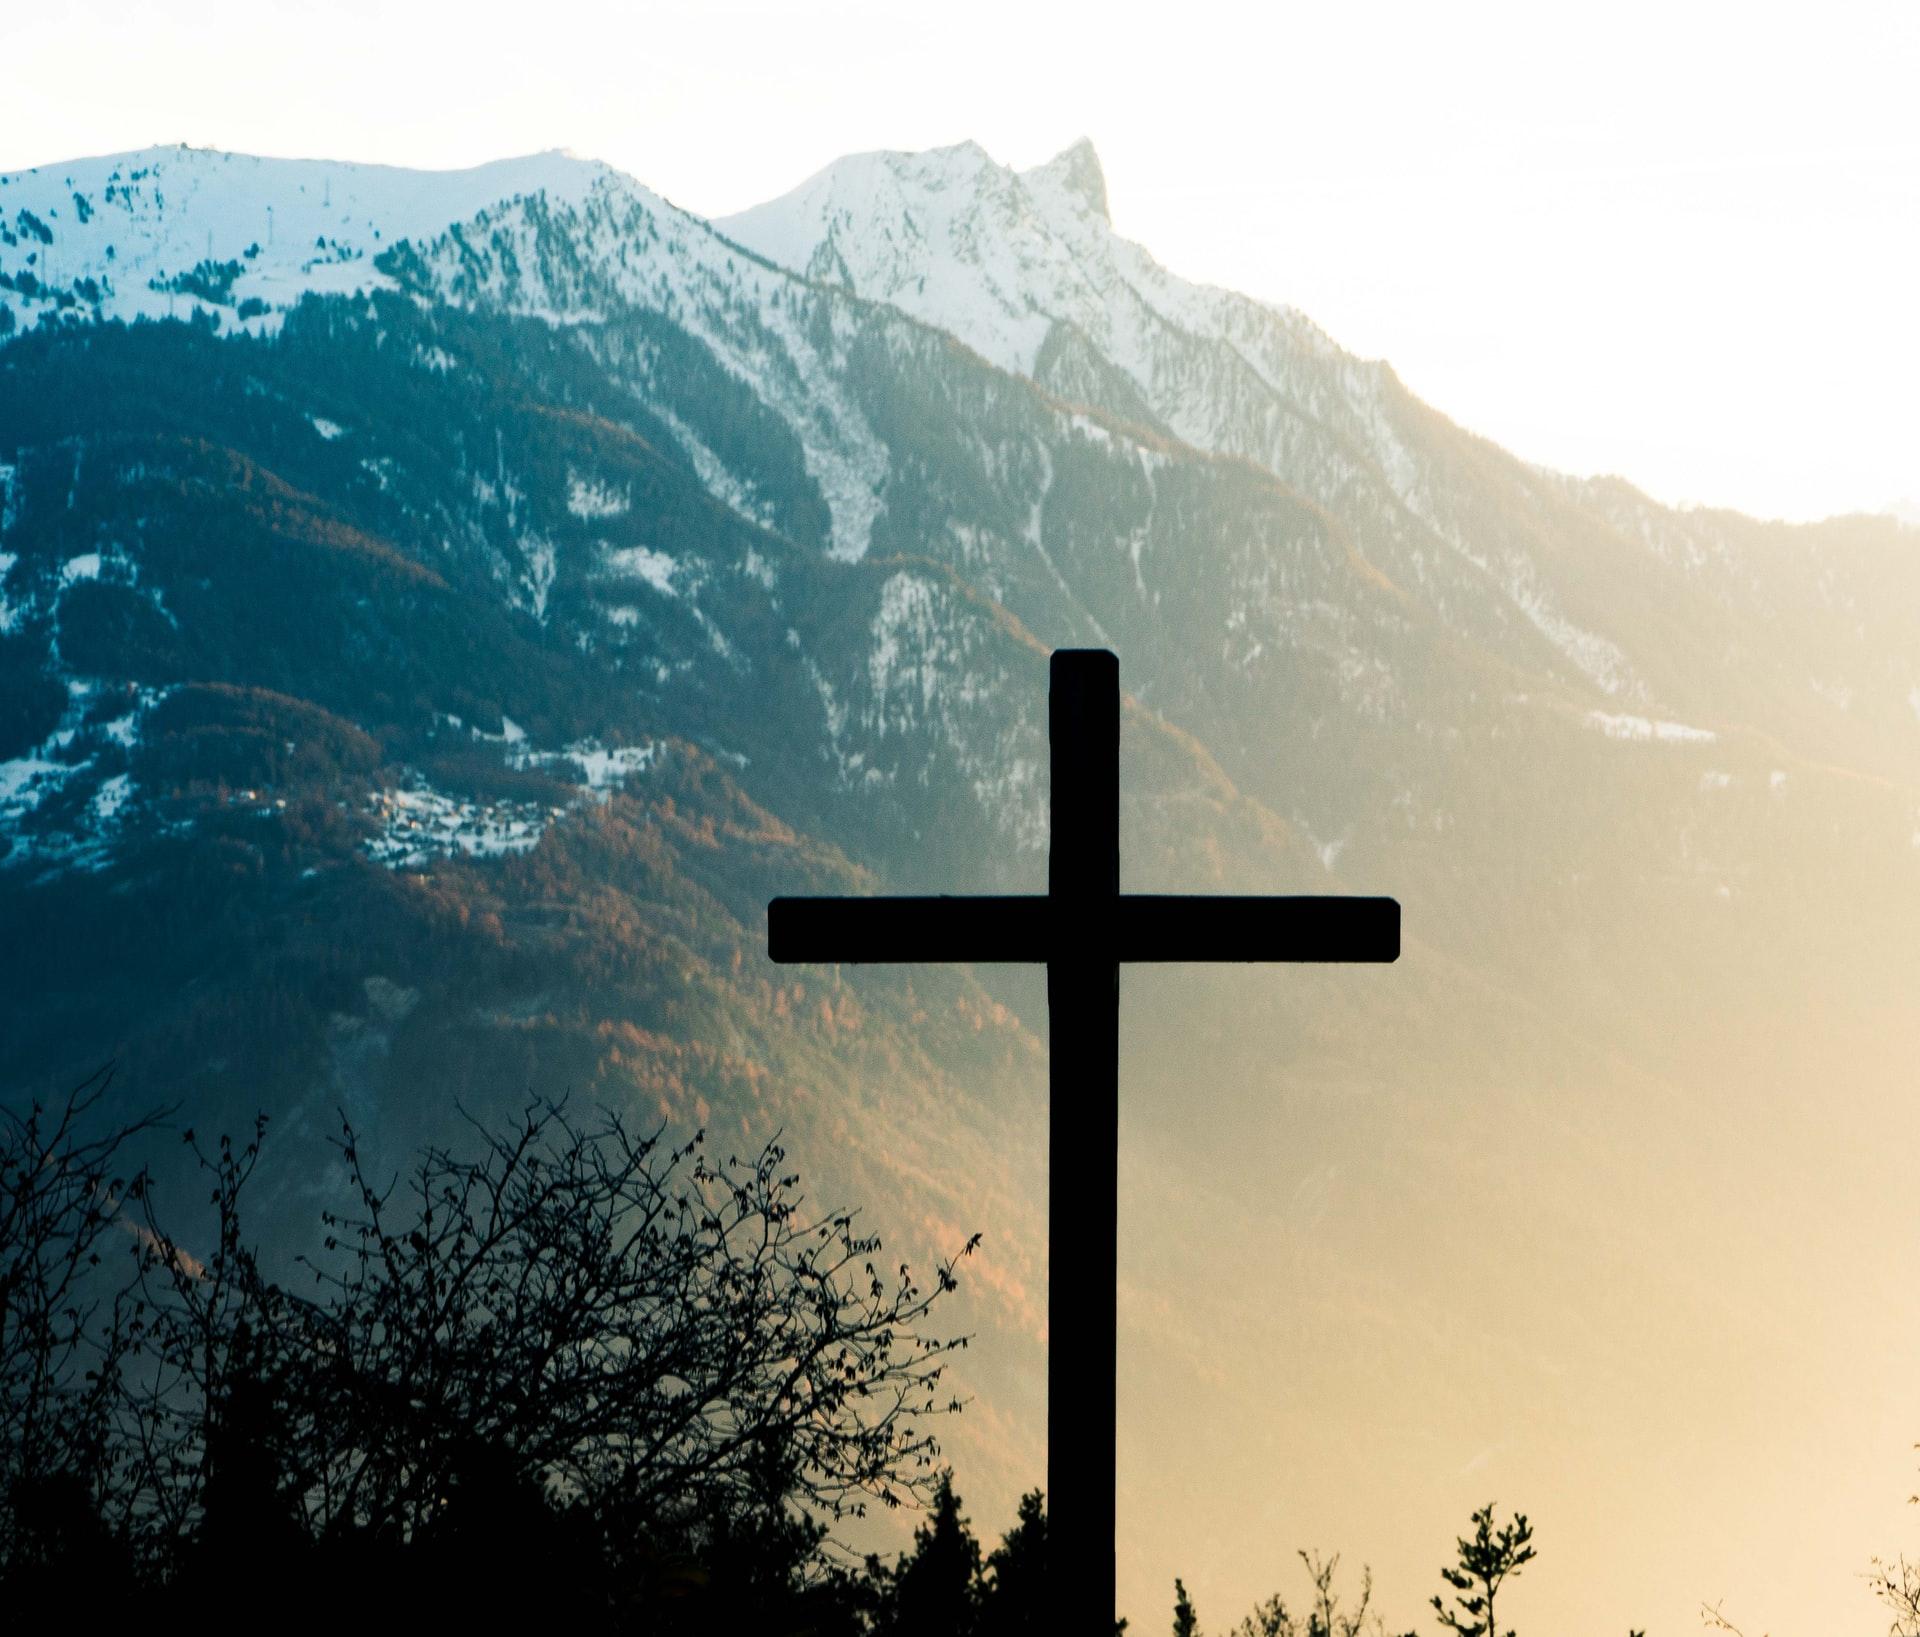 Territorial Warfare and Church Dominion Prayer